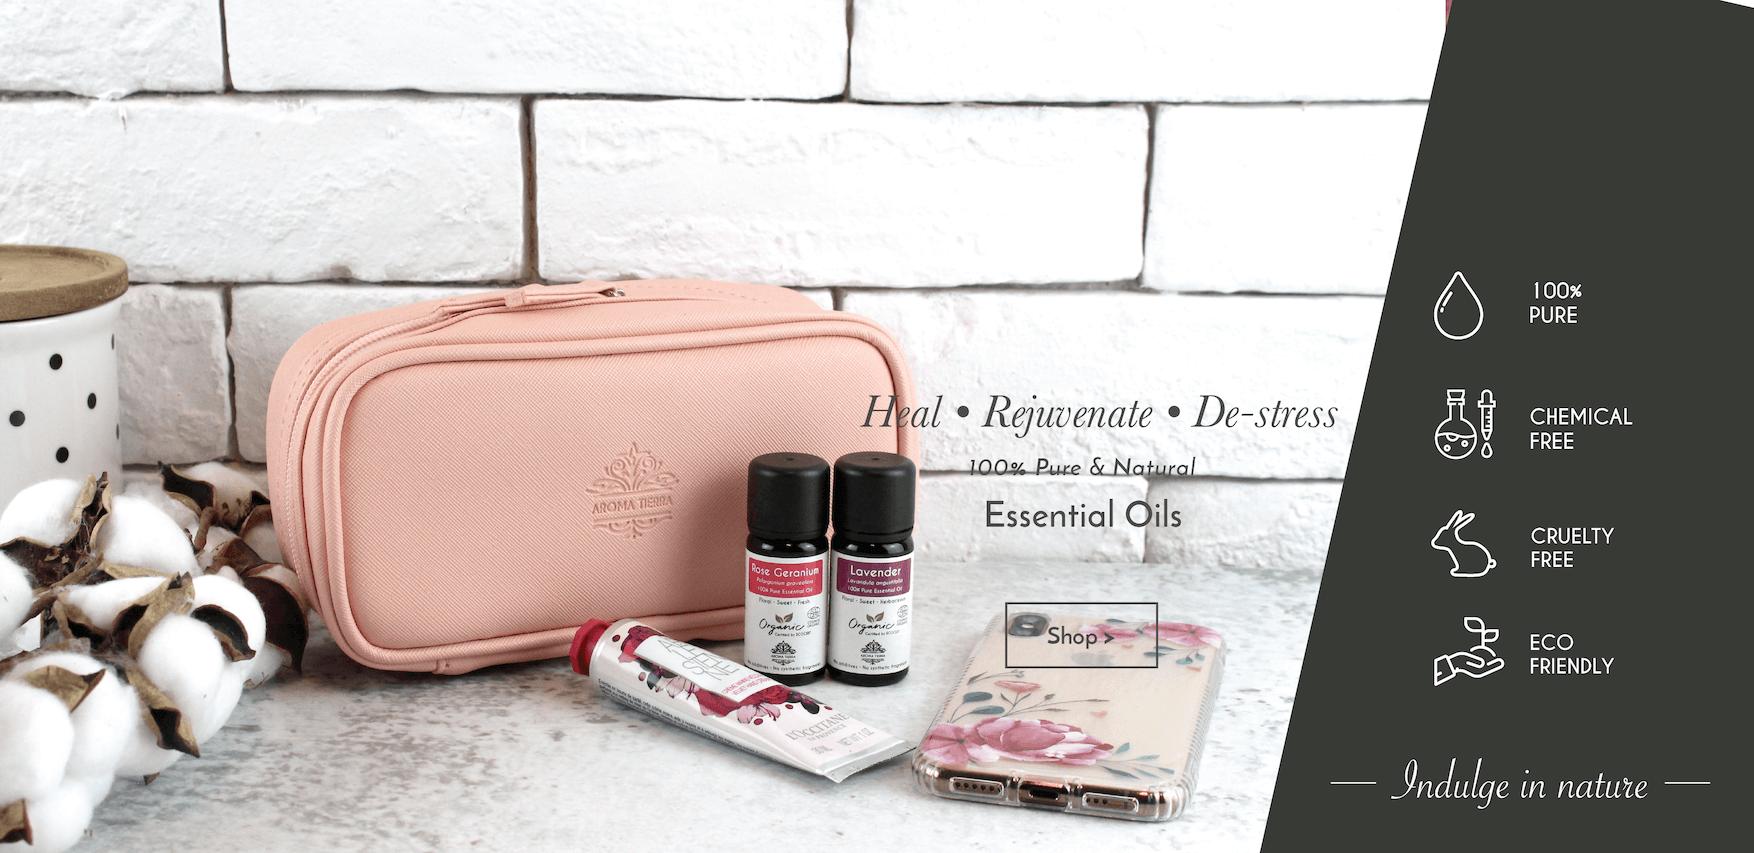 Aroma Tierra 100% pure essential oils